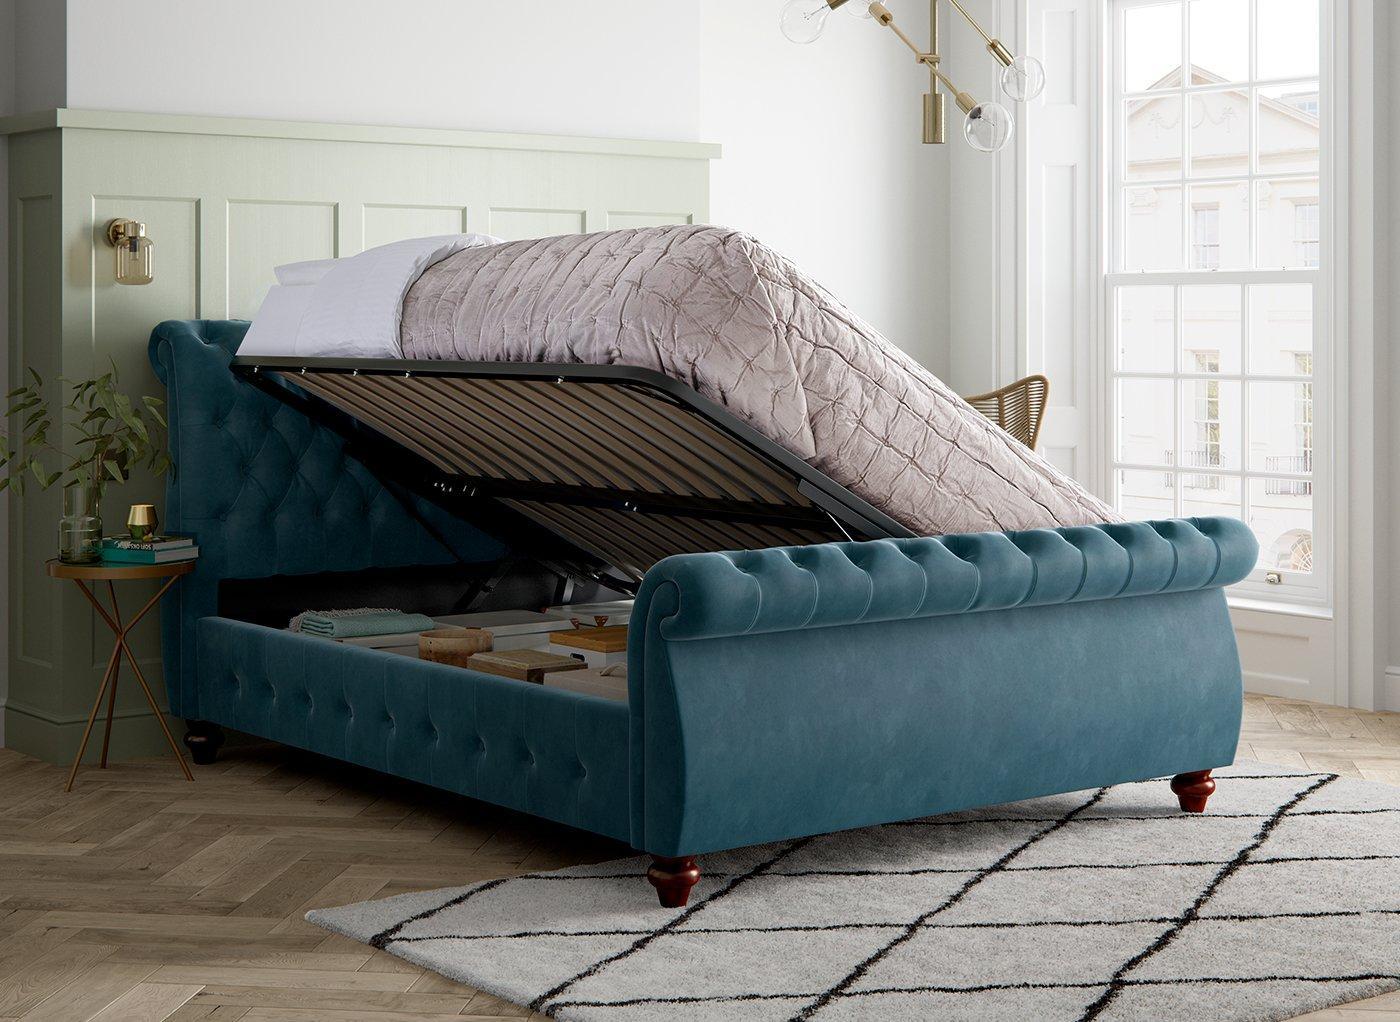 holmes-upholstered-ottoman-bed-frame